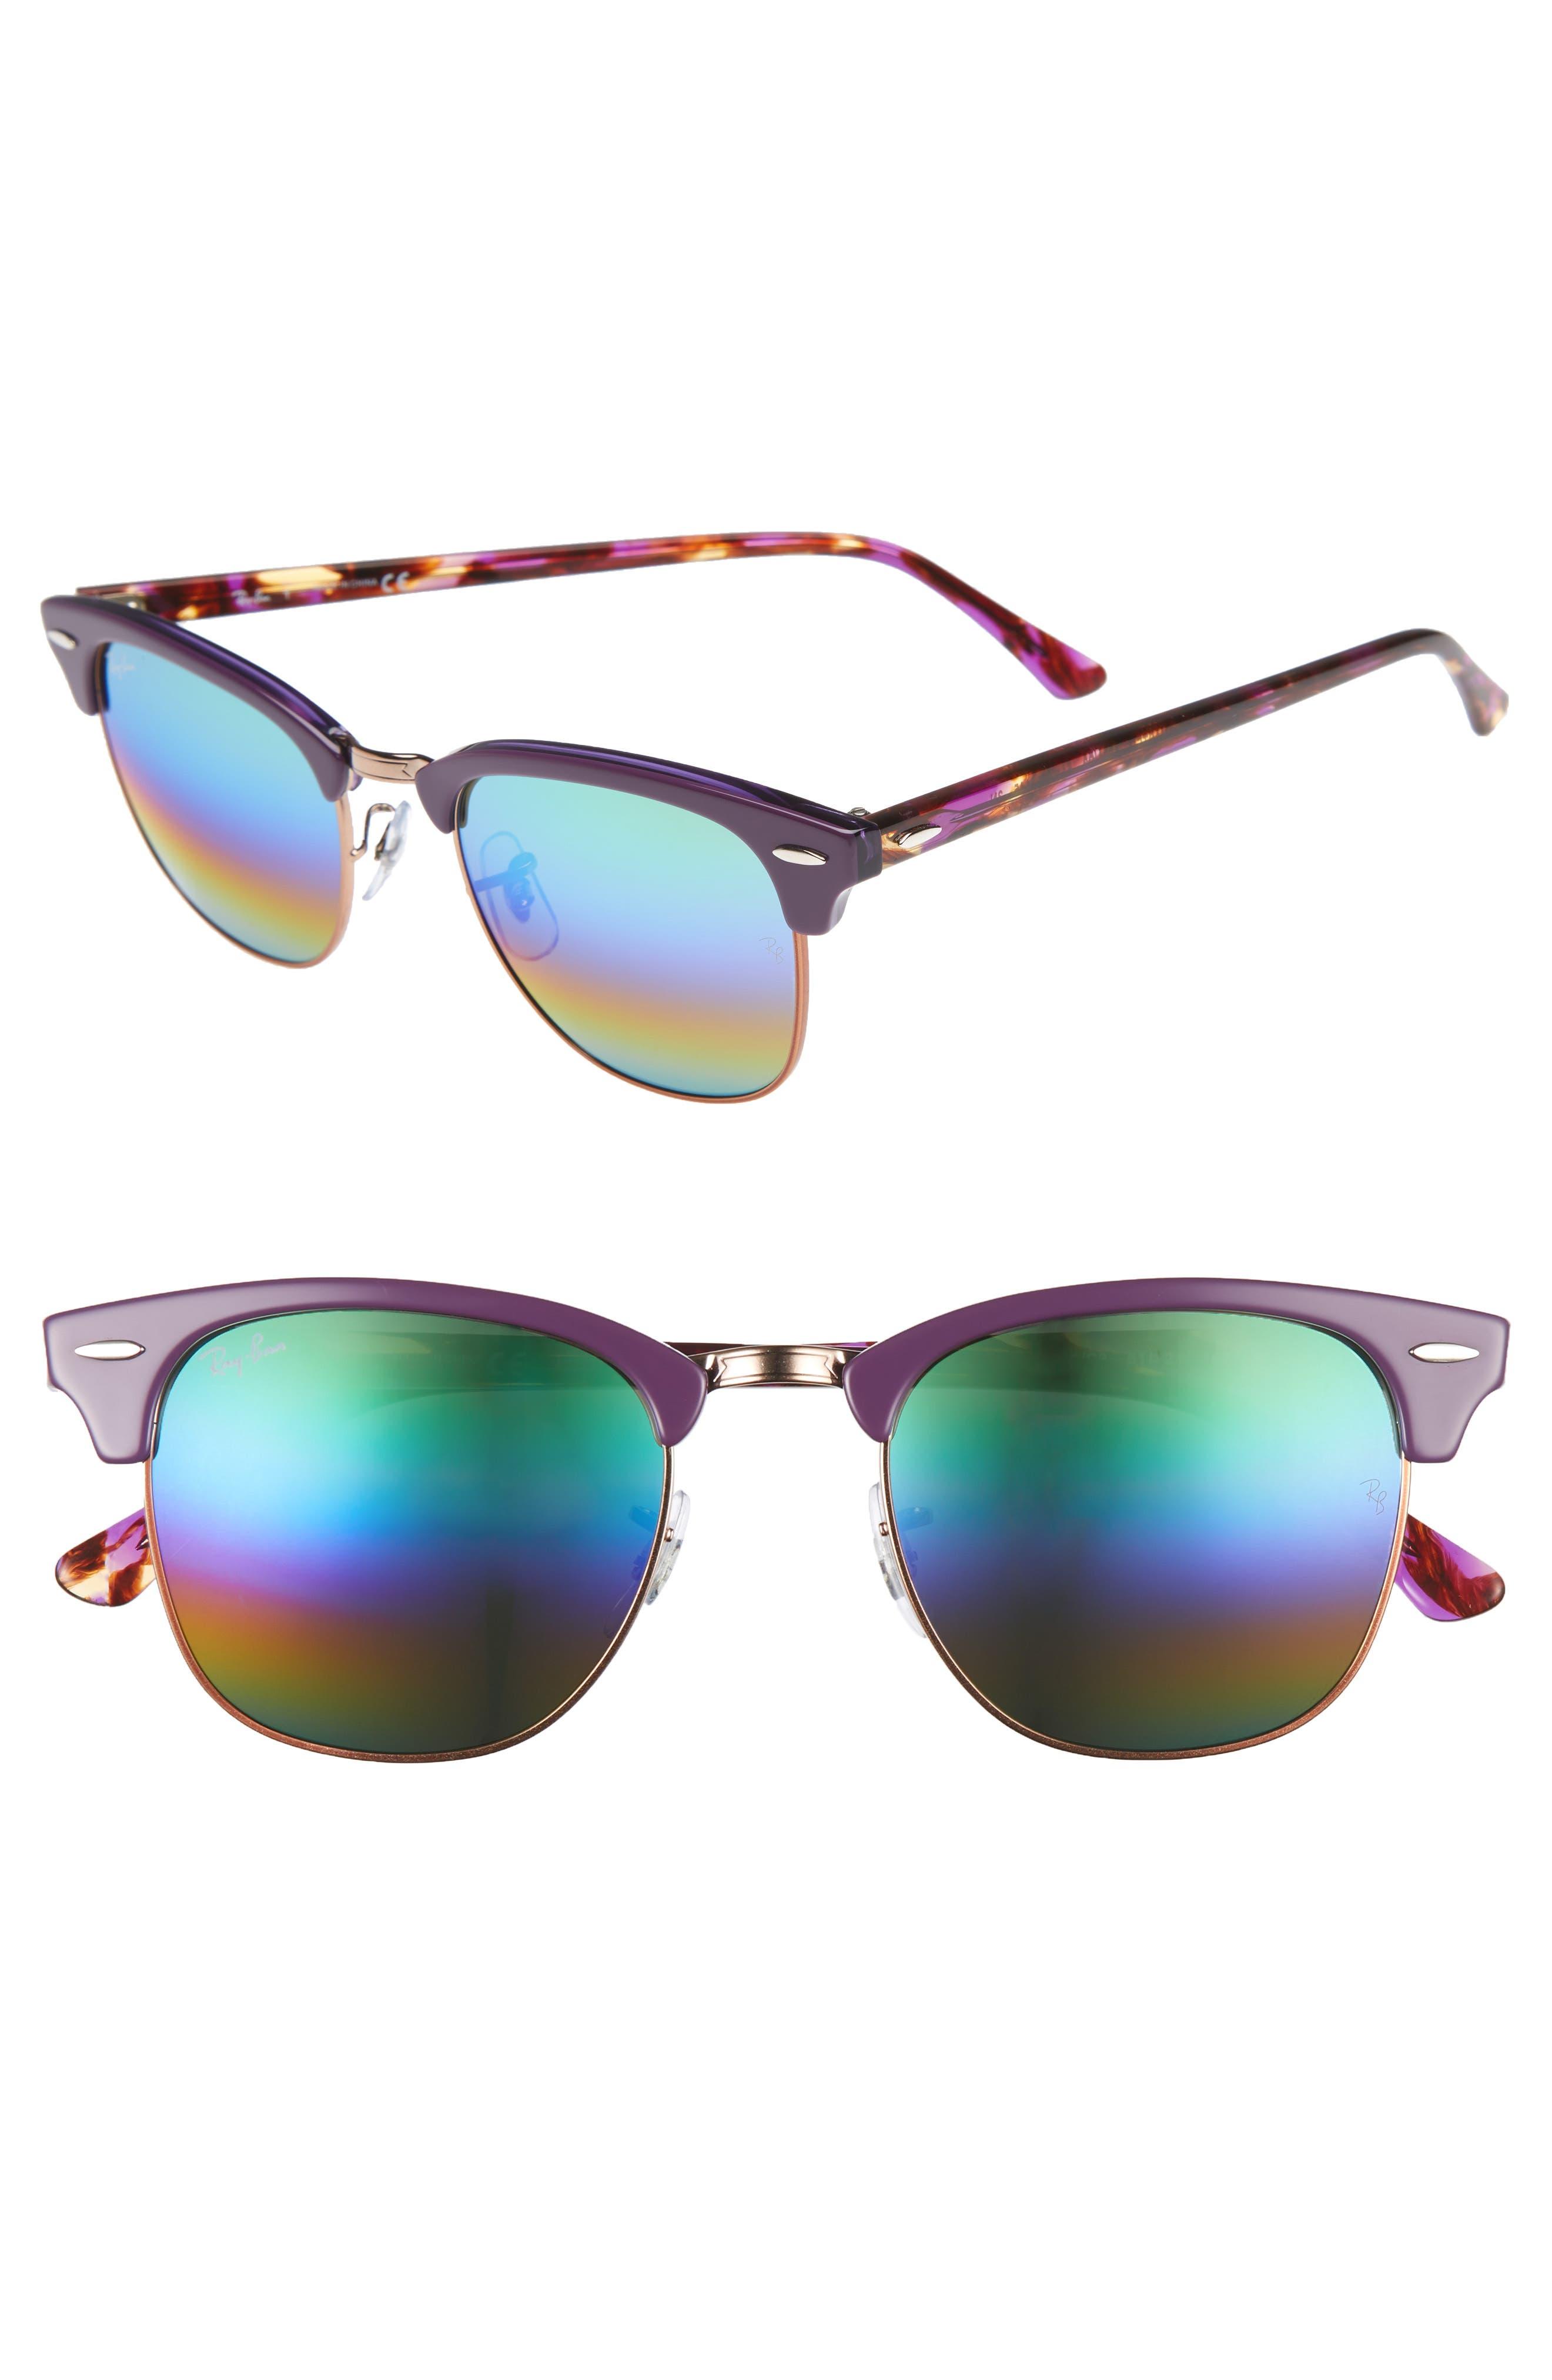 RAY-BAN Standard Clubmaster 51mm Mirrored Rainbow Sunglasses